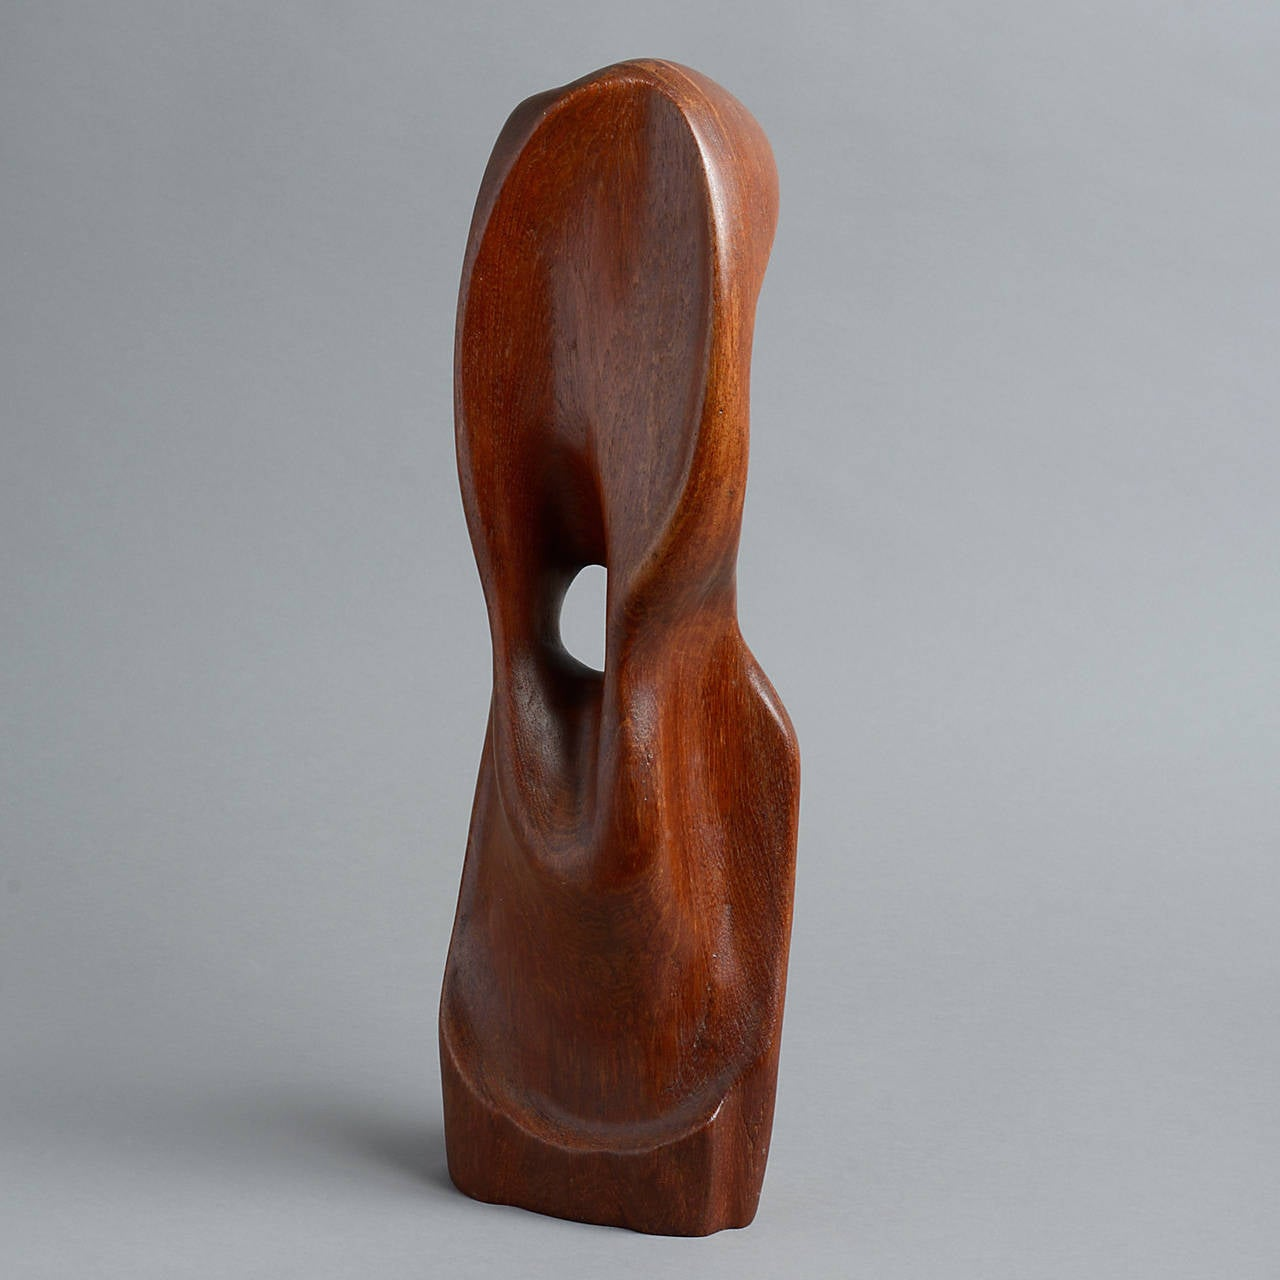 Mid 20th Century Modern British Teak Sculpture At 1stdibs